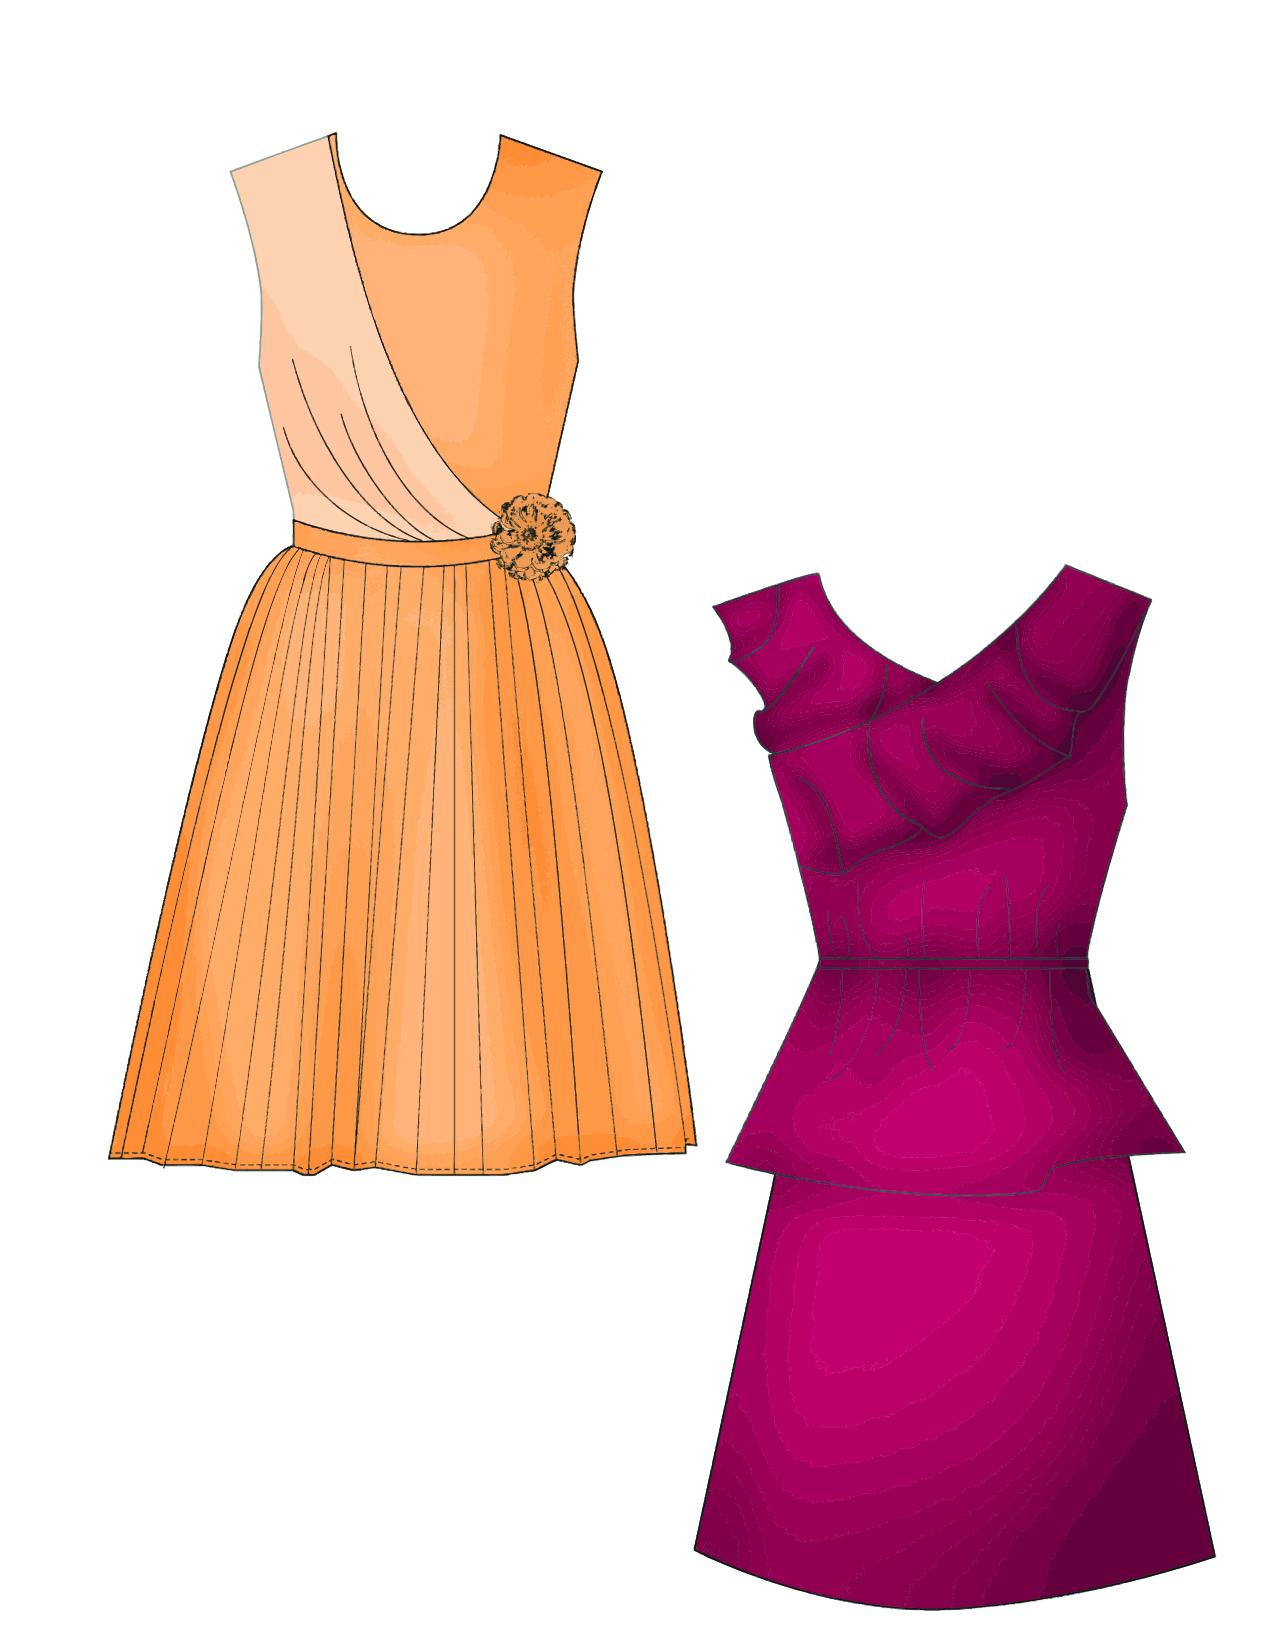 fashion-illustrations-28.jpg